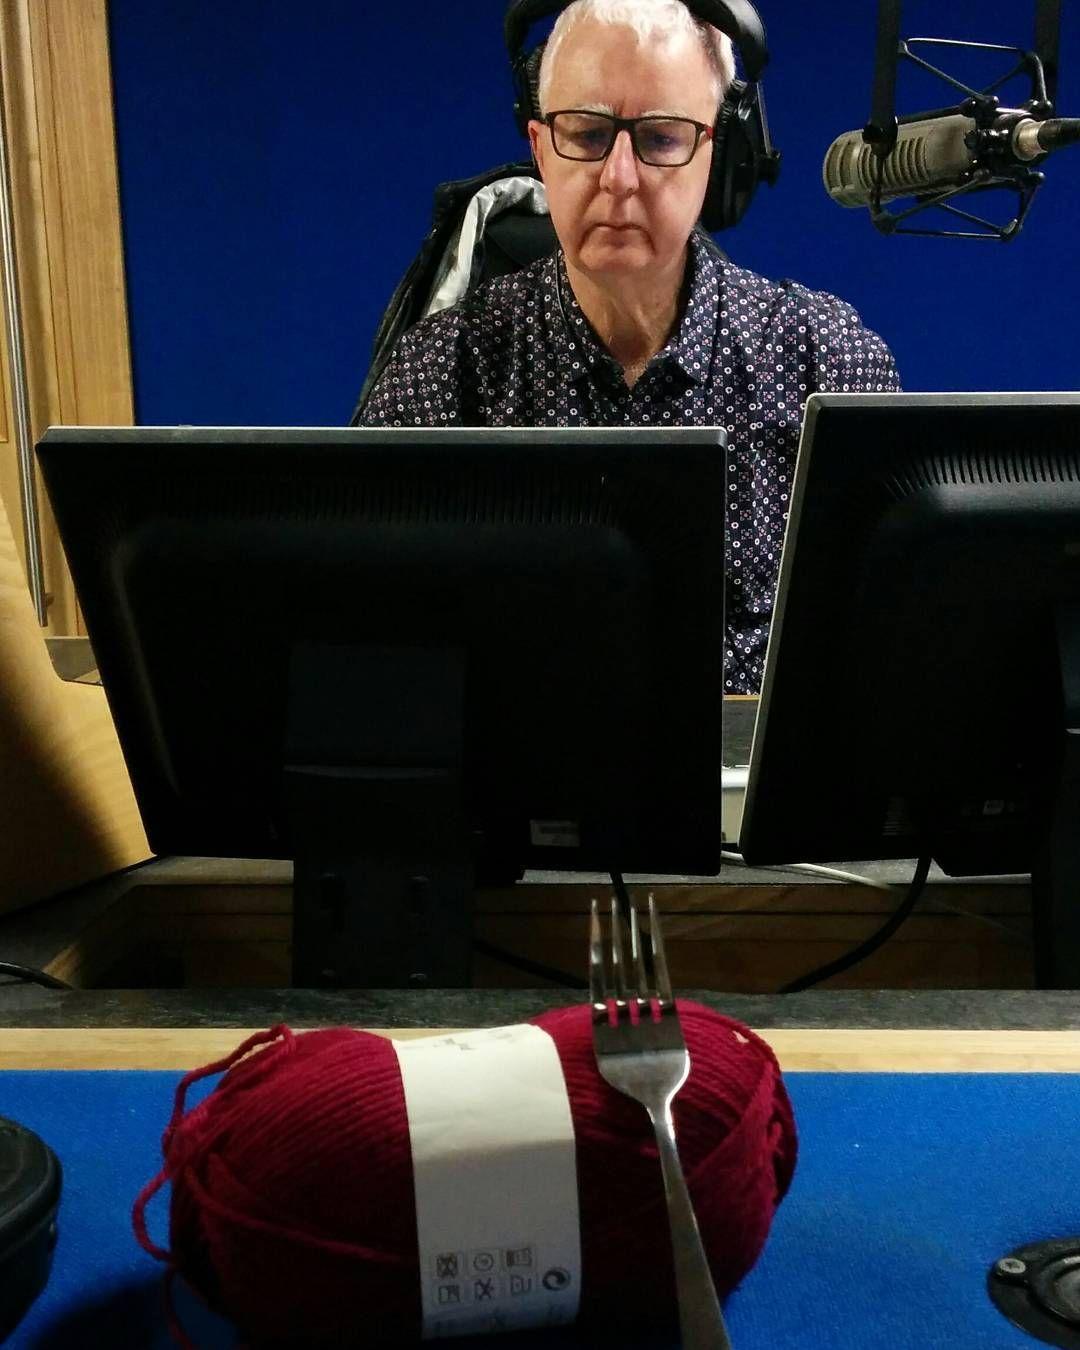 Teaching John Masterson of KCLR Live to knit a tiny beanie for @innocentdrinks #bigknit #ageaction #ageactionireland